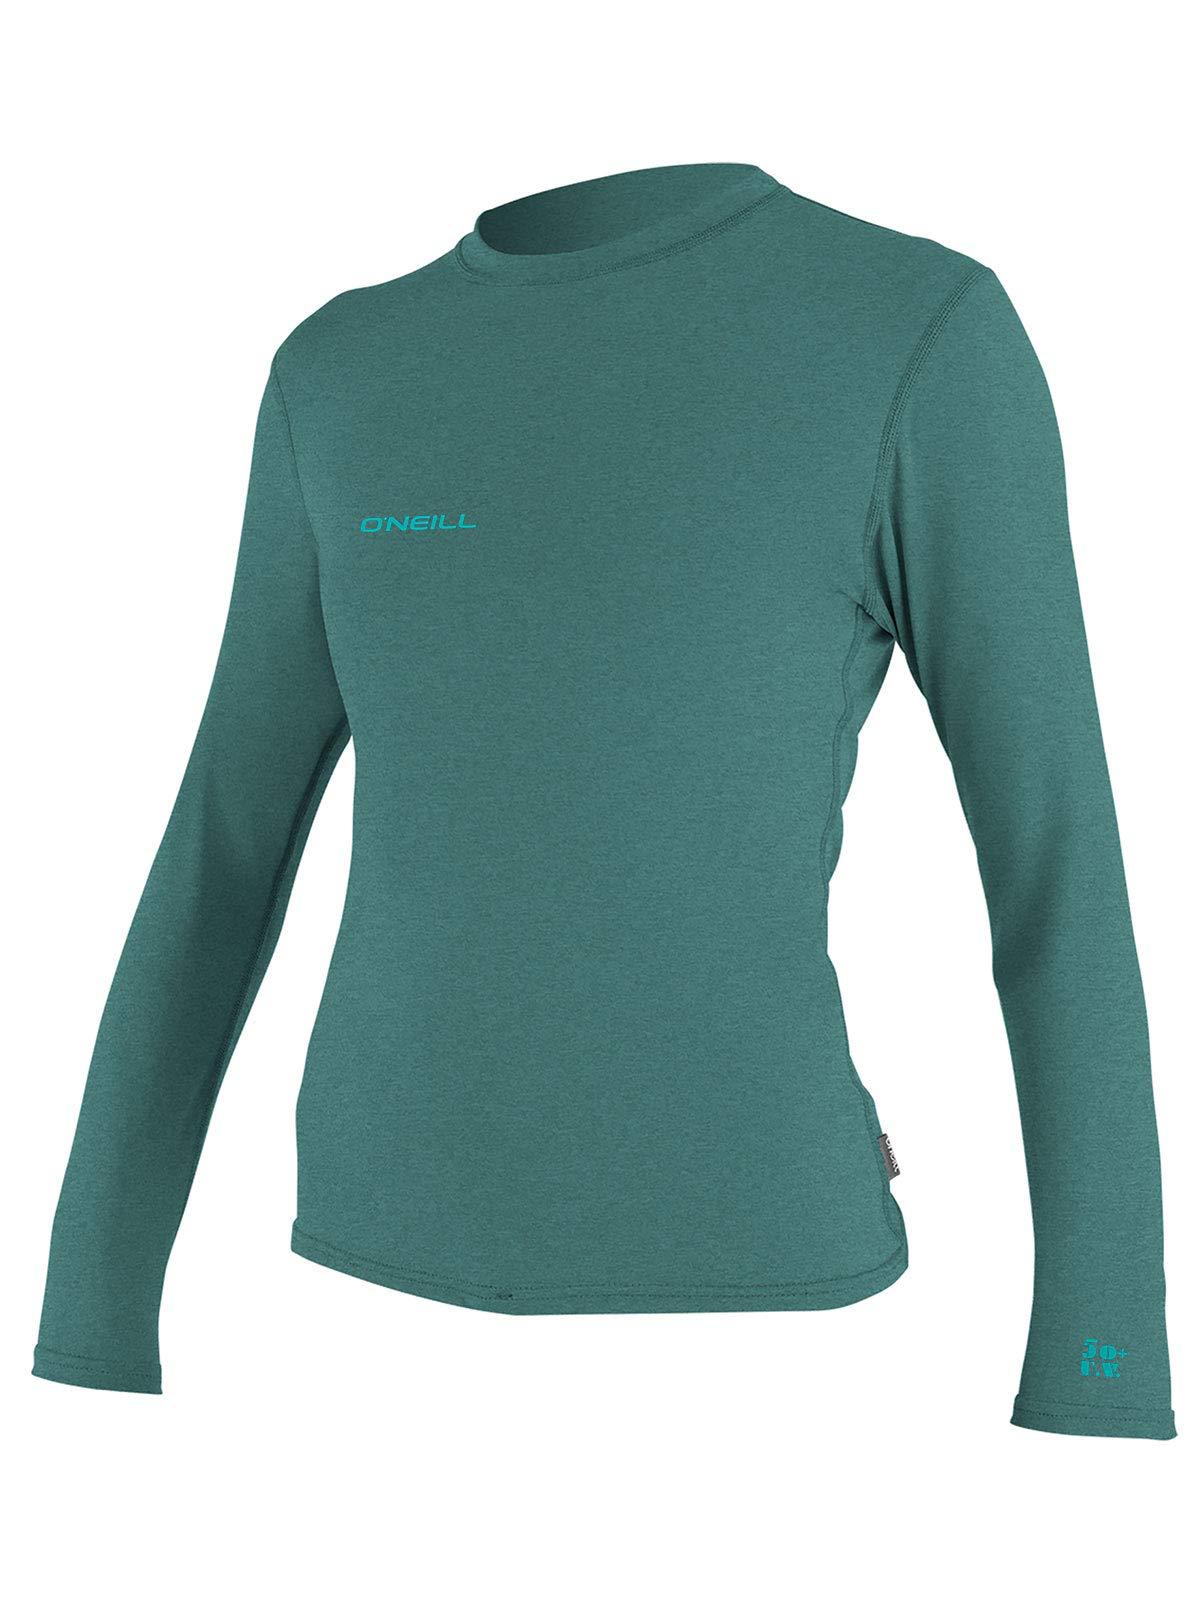 O'Neill Wetsuits Women's Hybrid UPF 50+ Long Sleeve Sun Shirt, Eucalyptus, X-Small